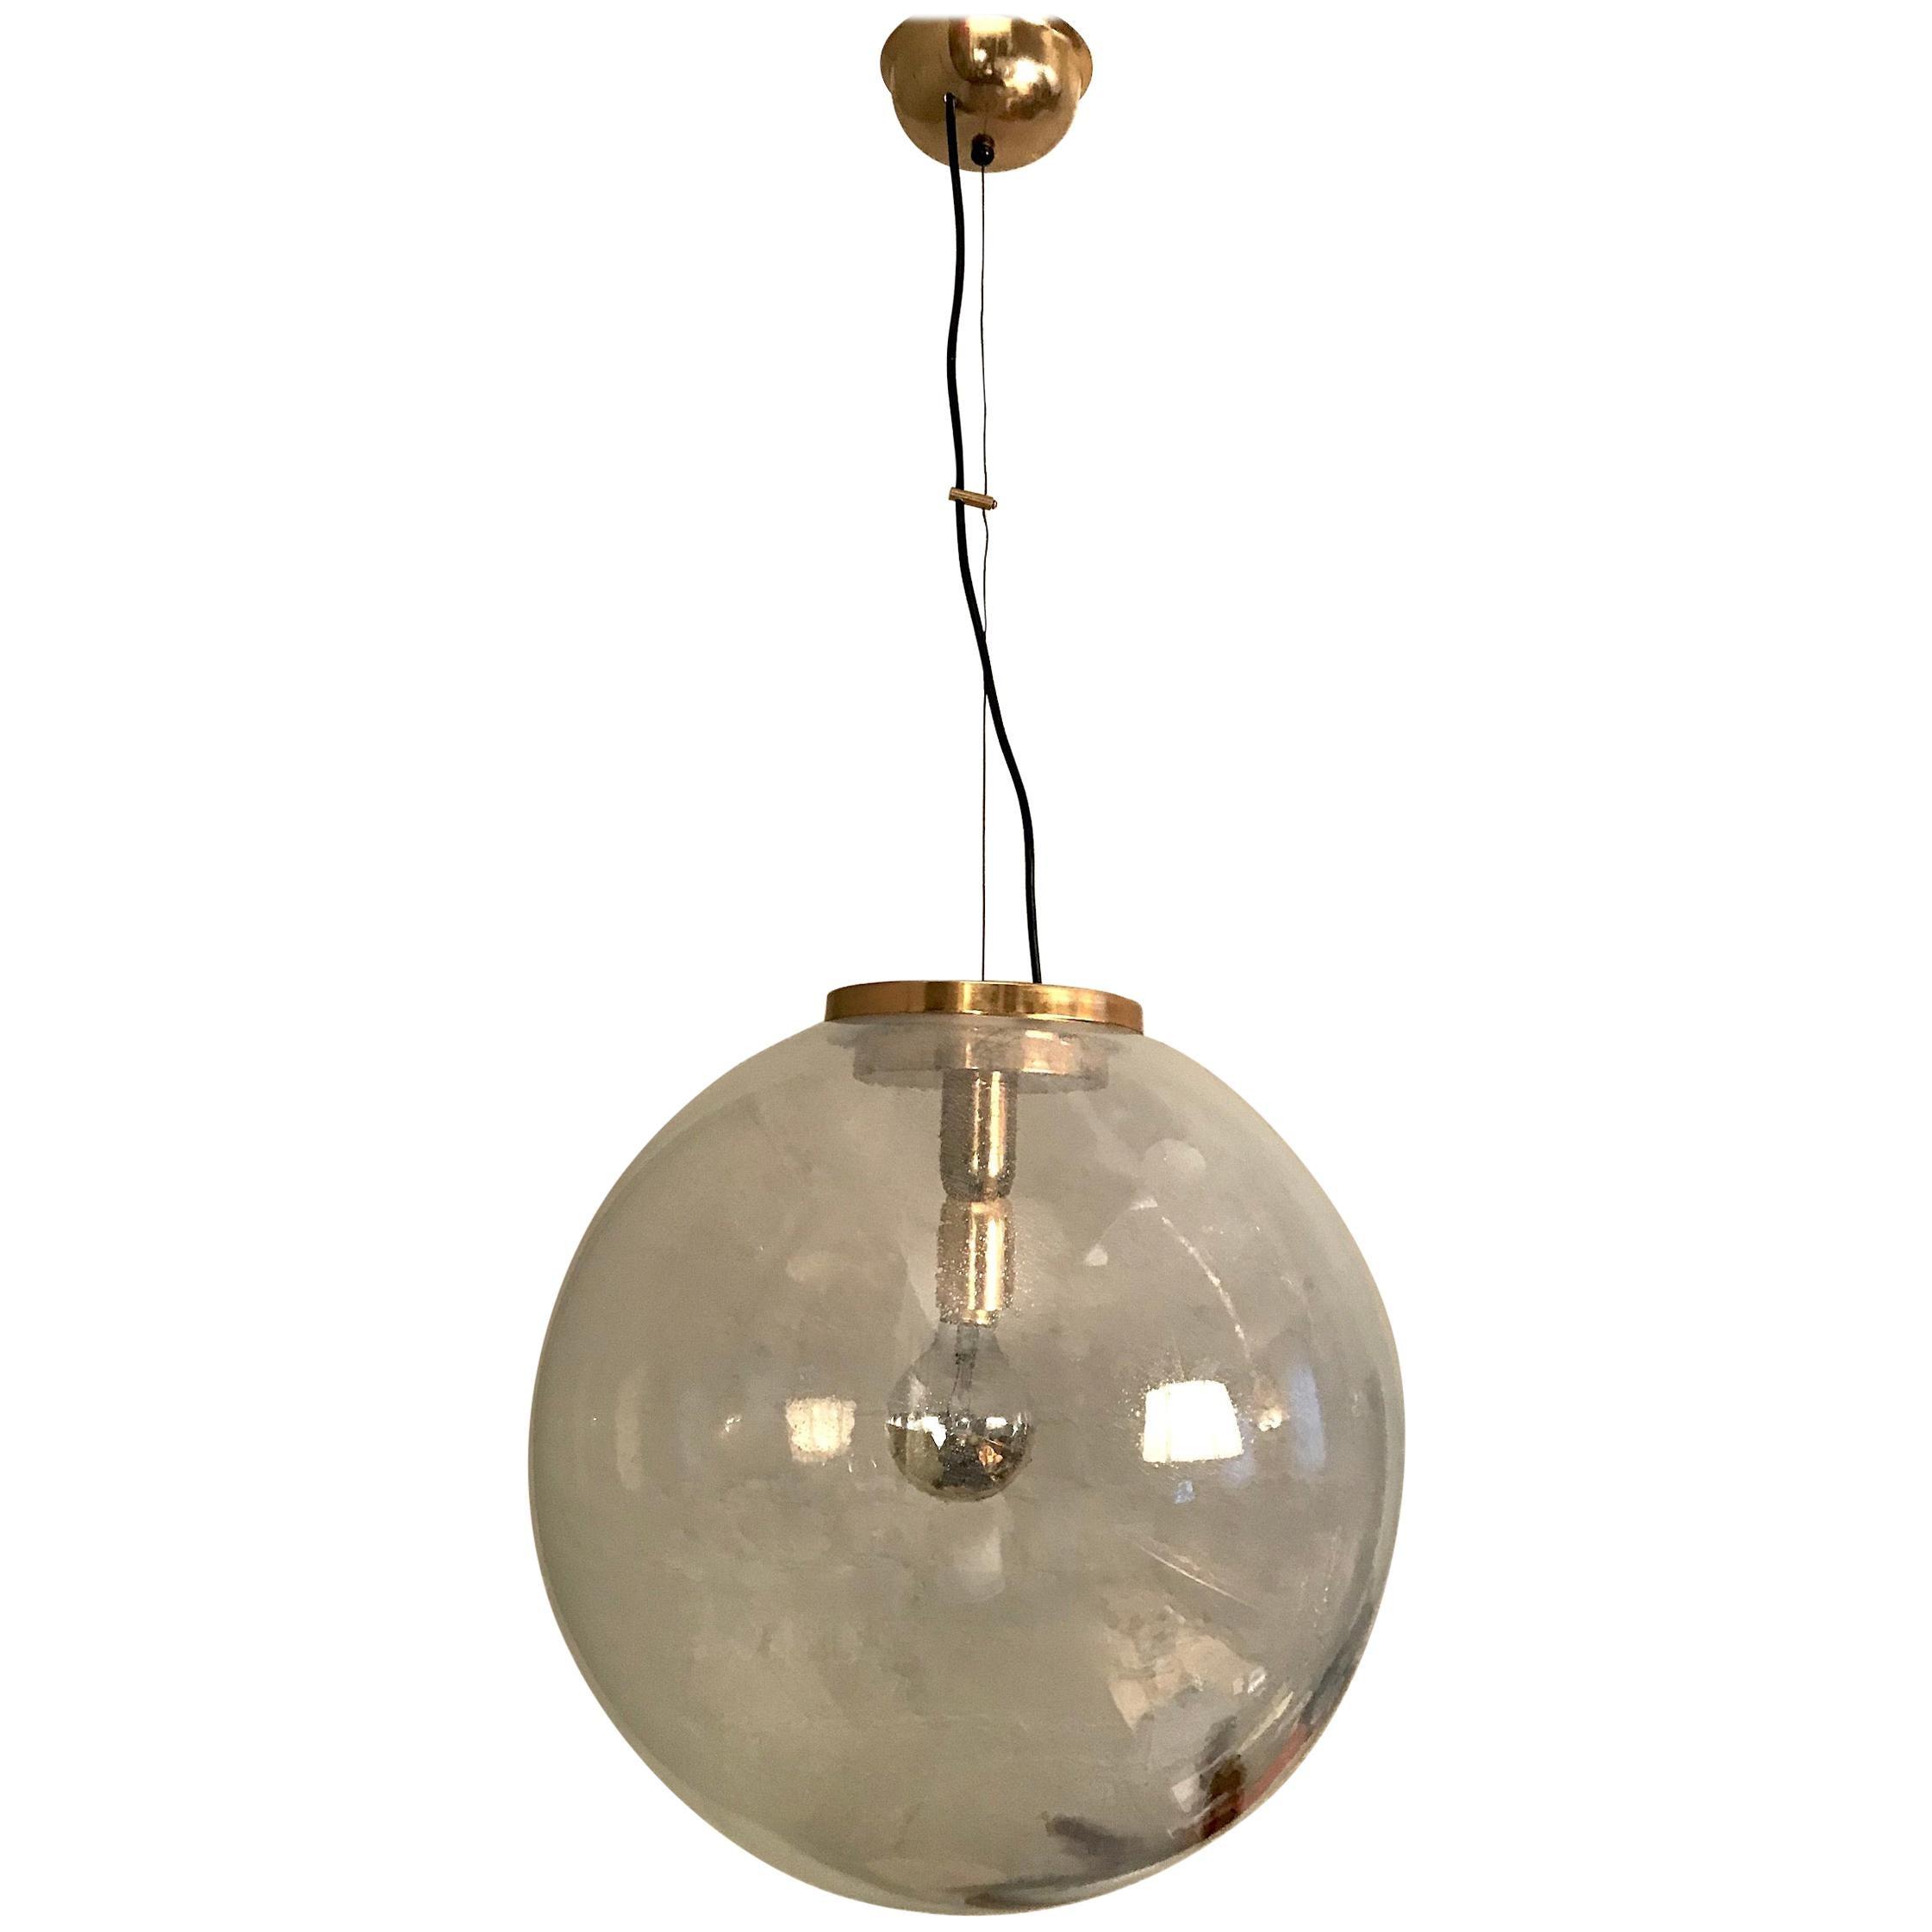 Italian 1970s Large Poligoso Globe Pendant Light